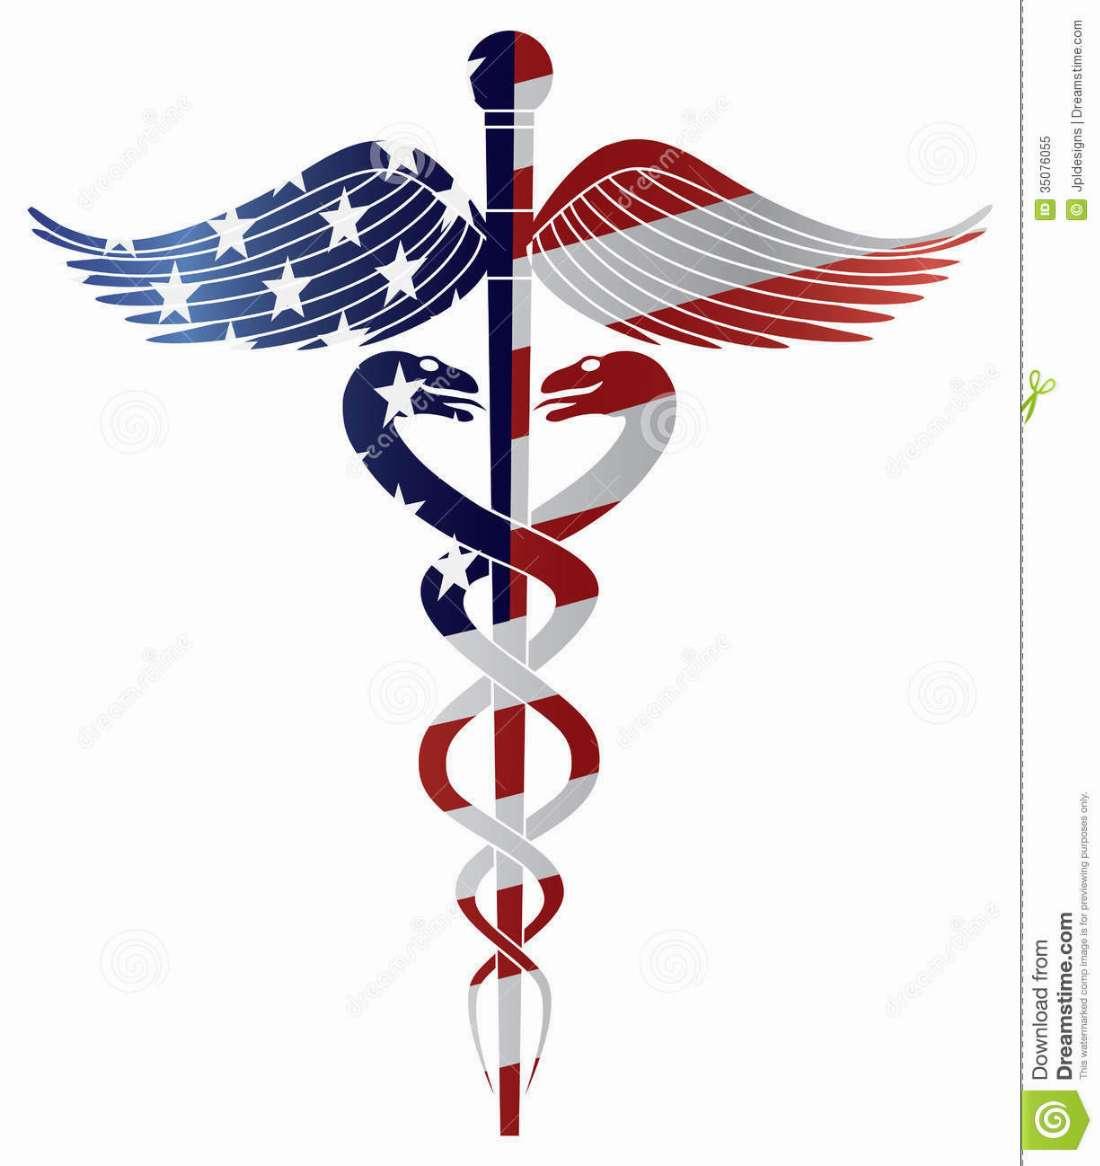 caduceus-medical-symbol-usa-flag-illustration-healthcare-reform-united-states-america-silhouette-isolated-white-35076055_1571682165.jpg